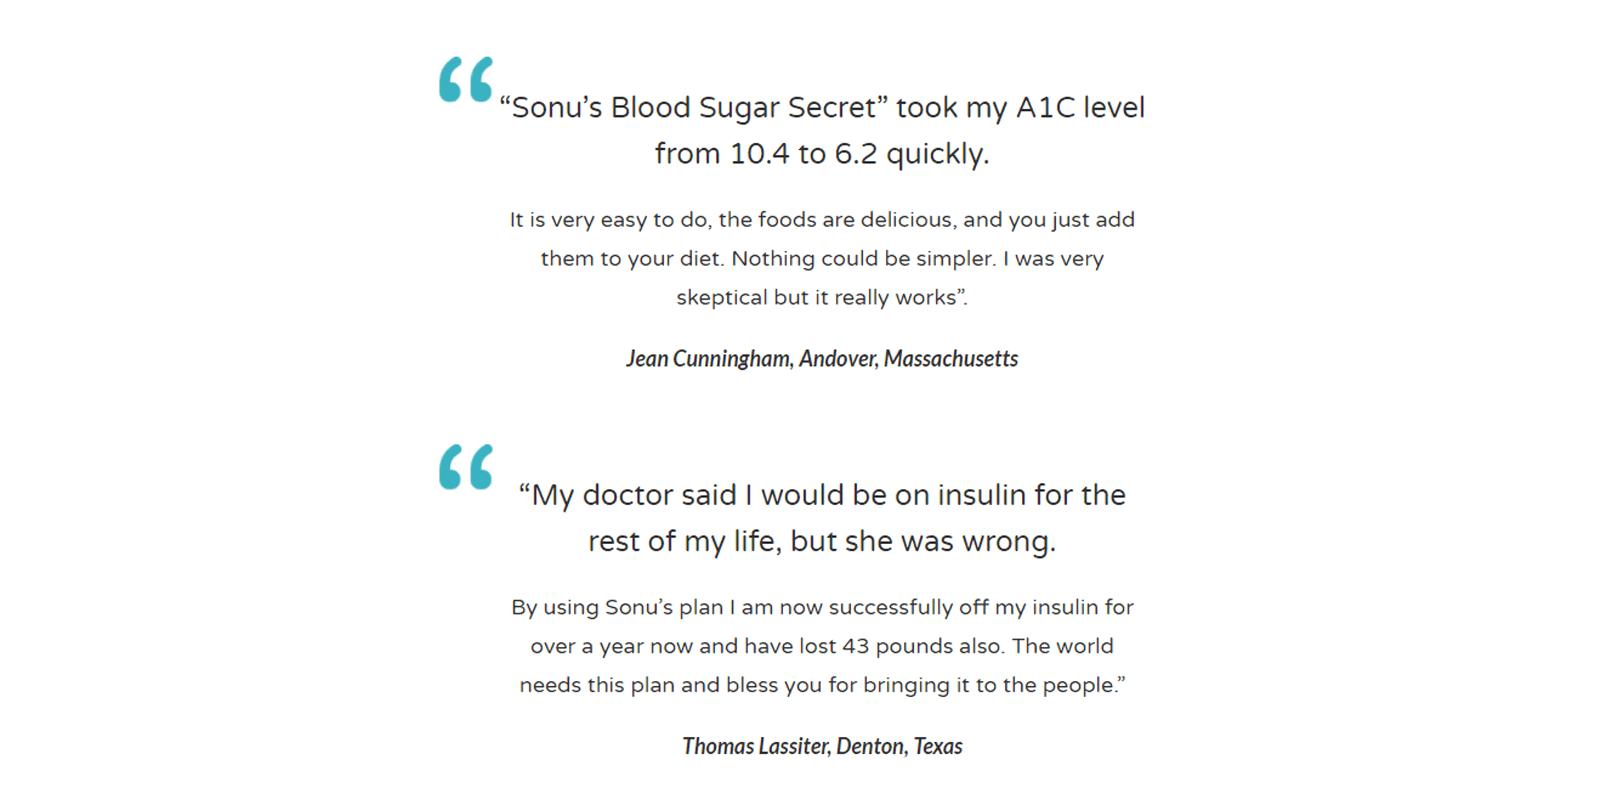 Sonu's Diabetes Secret customer reviews